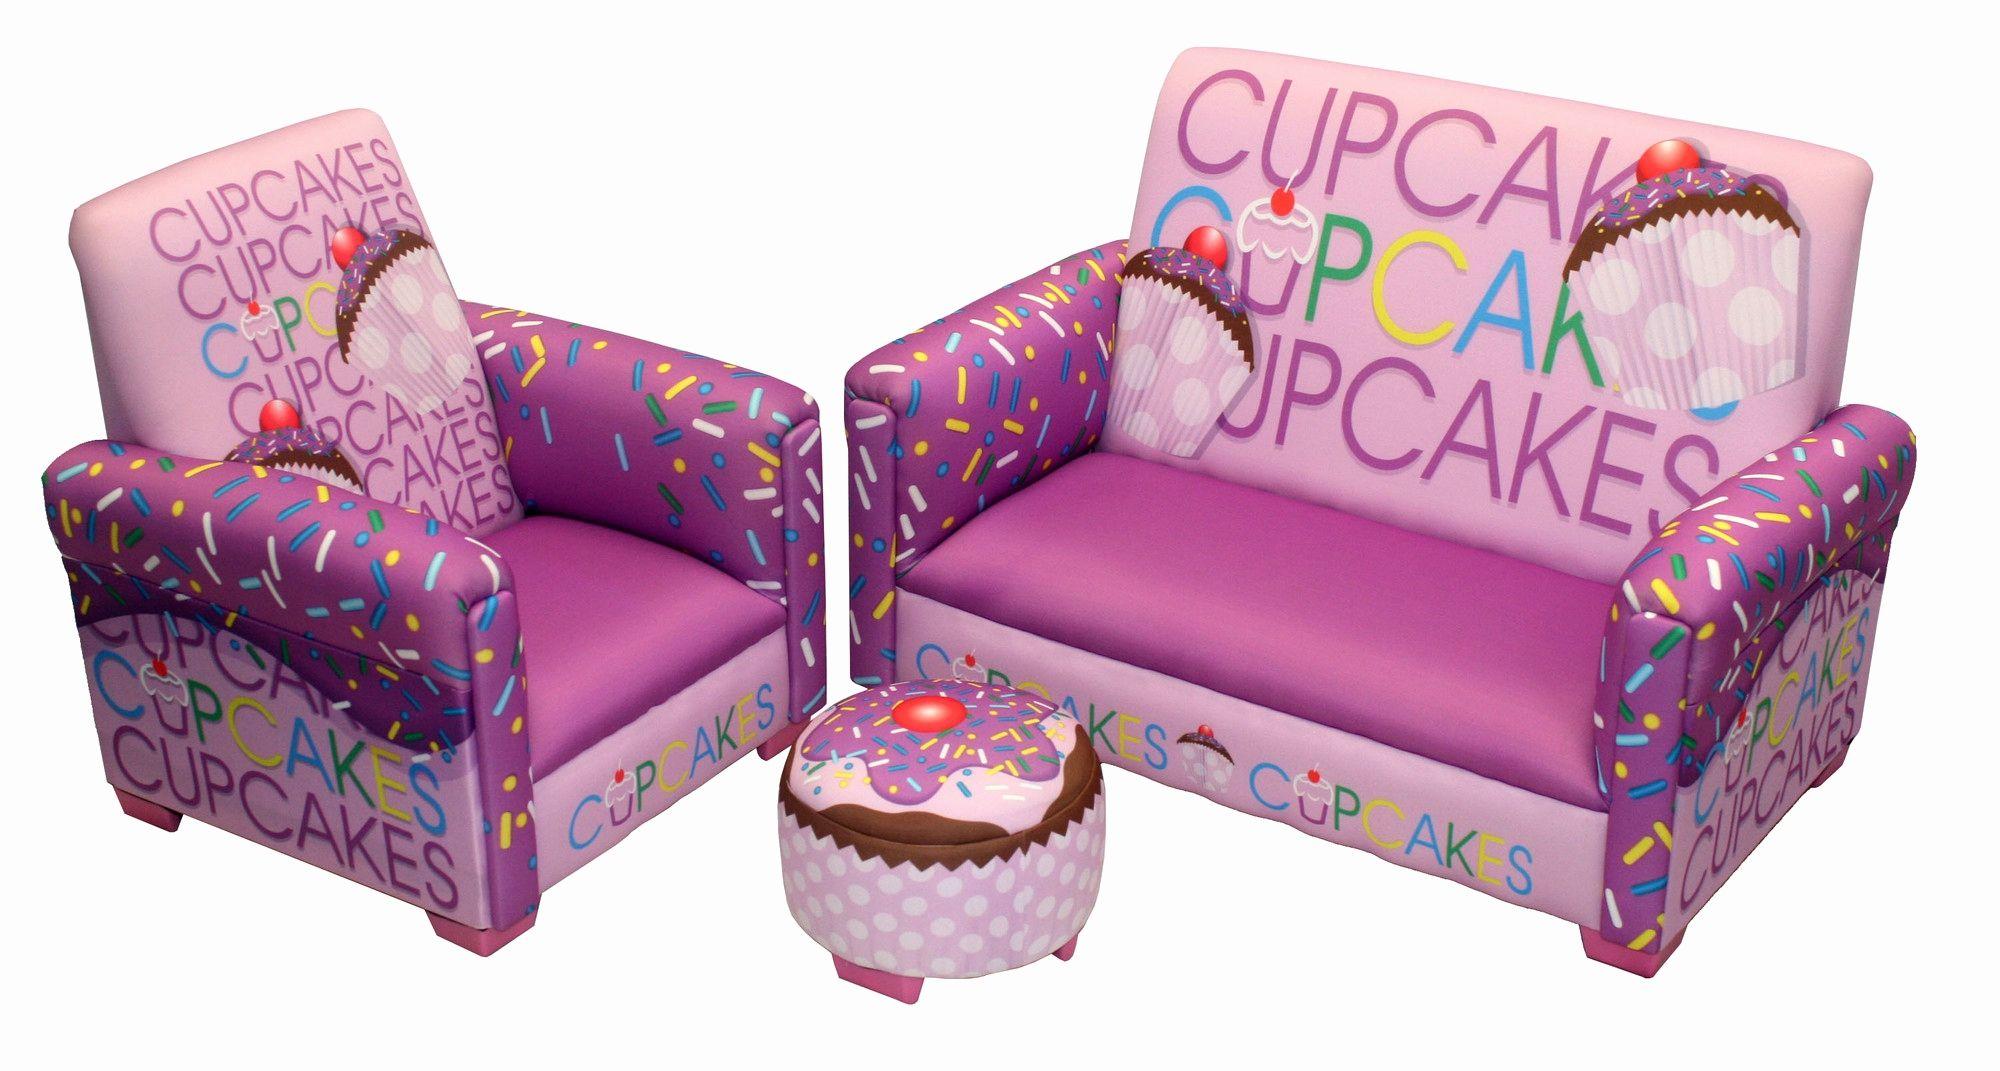 Idea Modern Purple Sofa Photos Modern Purple Sofa Lovely Modern Bedroom Chair Fabulous Queen Sleeper Sofa Living R Kids Sofa Toddler Sofa Chair Cupcake Bedroom